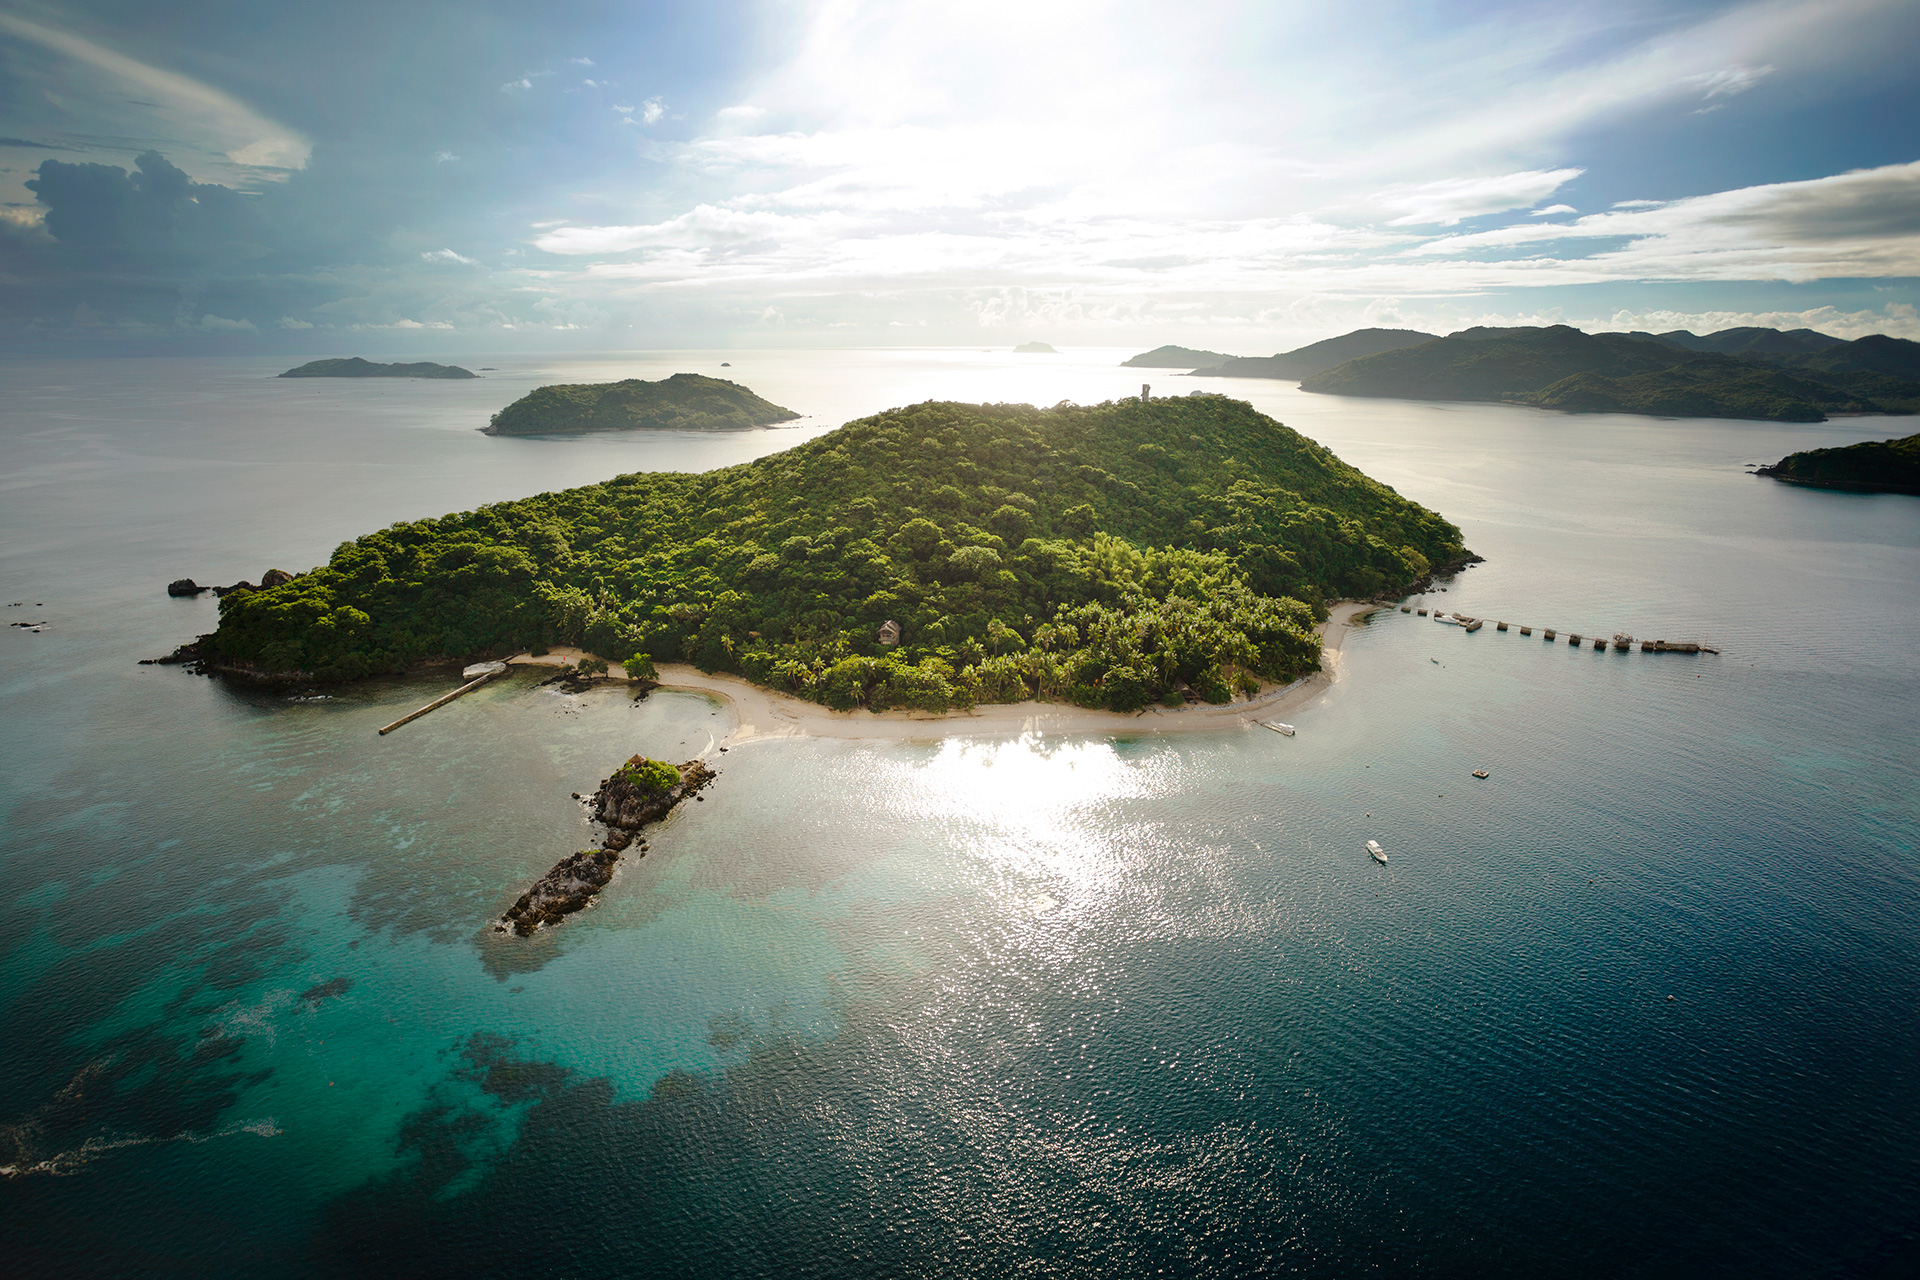 Aerial view of Flower Island in Taytay, Palawan